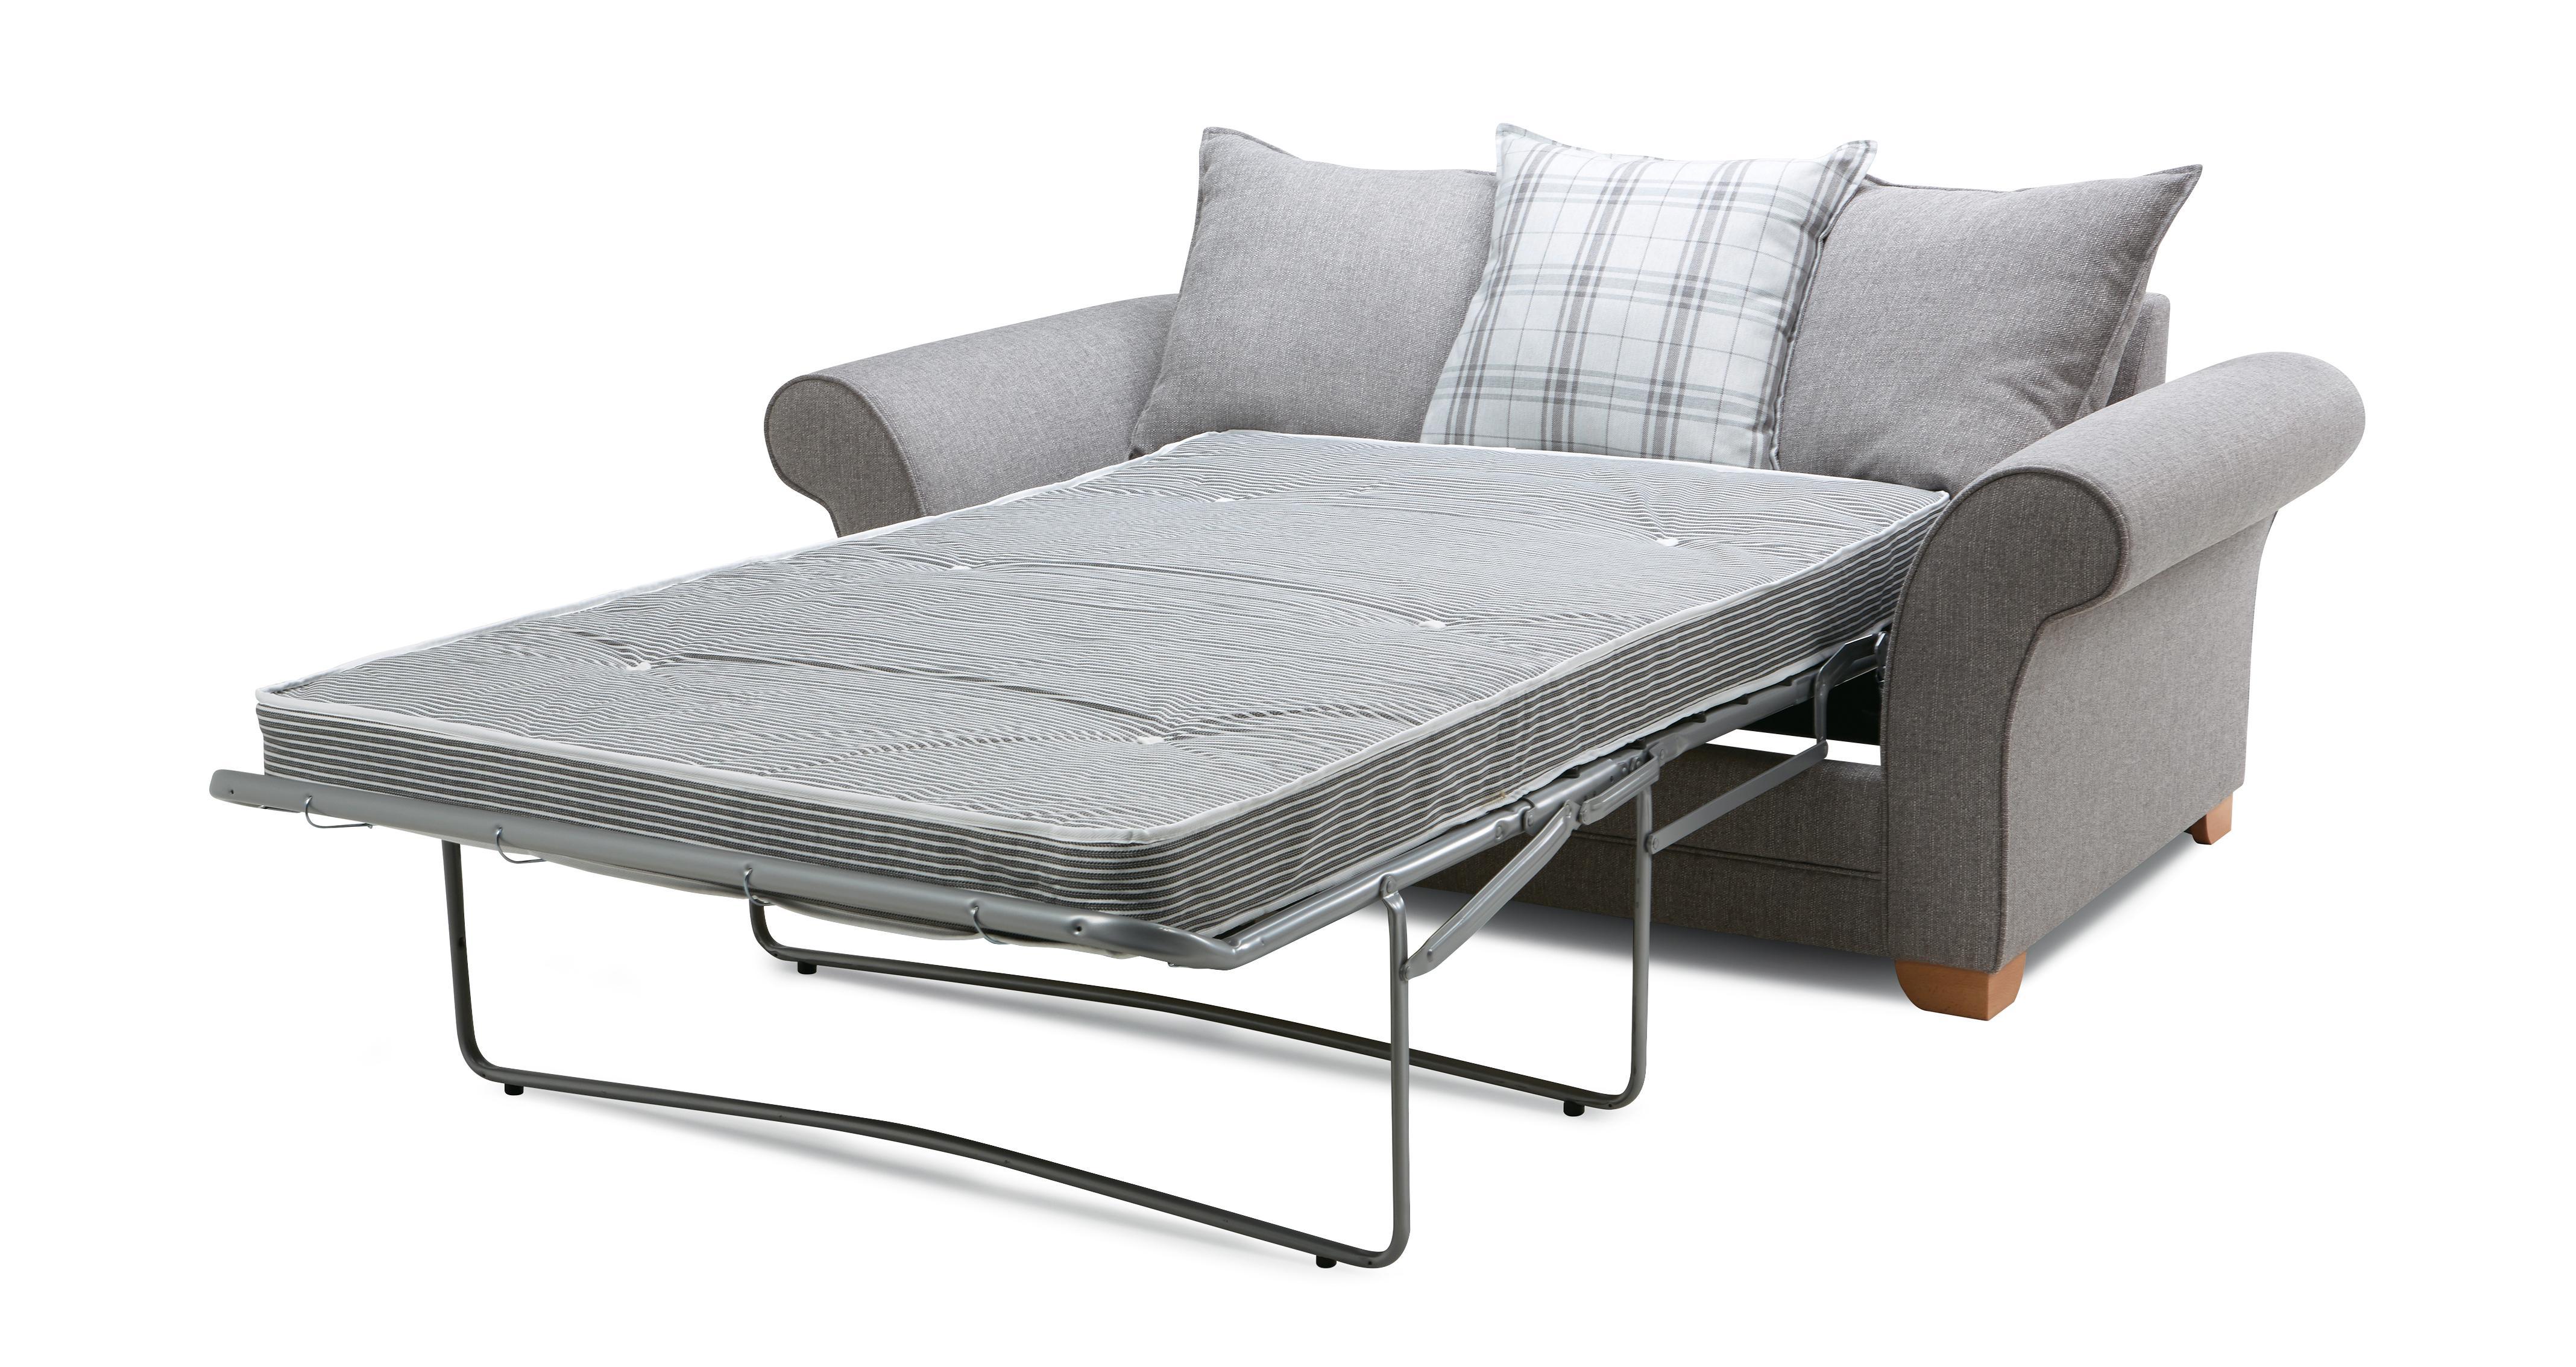 Elliott Plain 2 Seater Pillow Back Deluxe Sofa Bed Arran | DFS Ireland